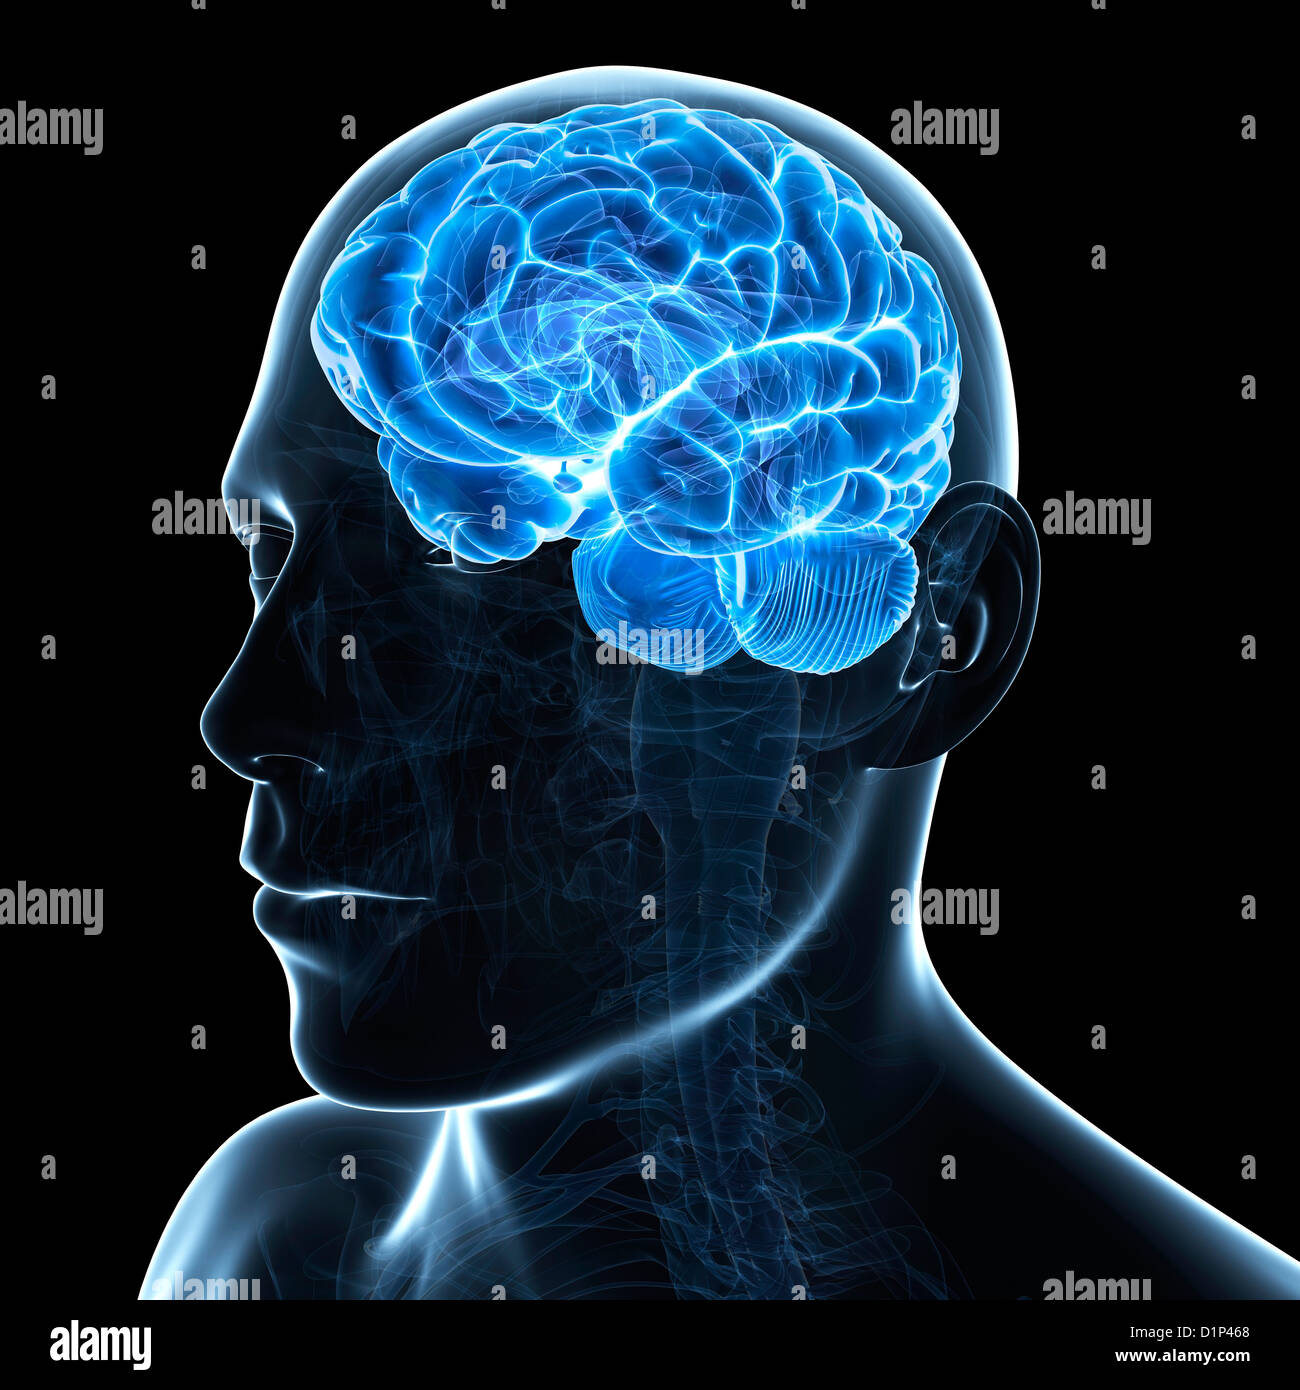 Male brain, artwork - Stock Image